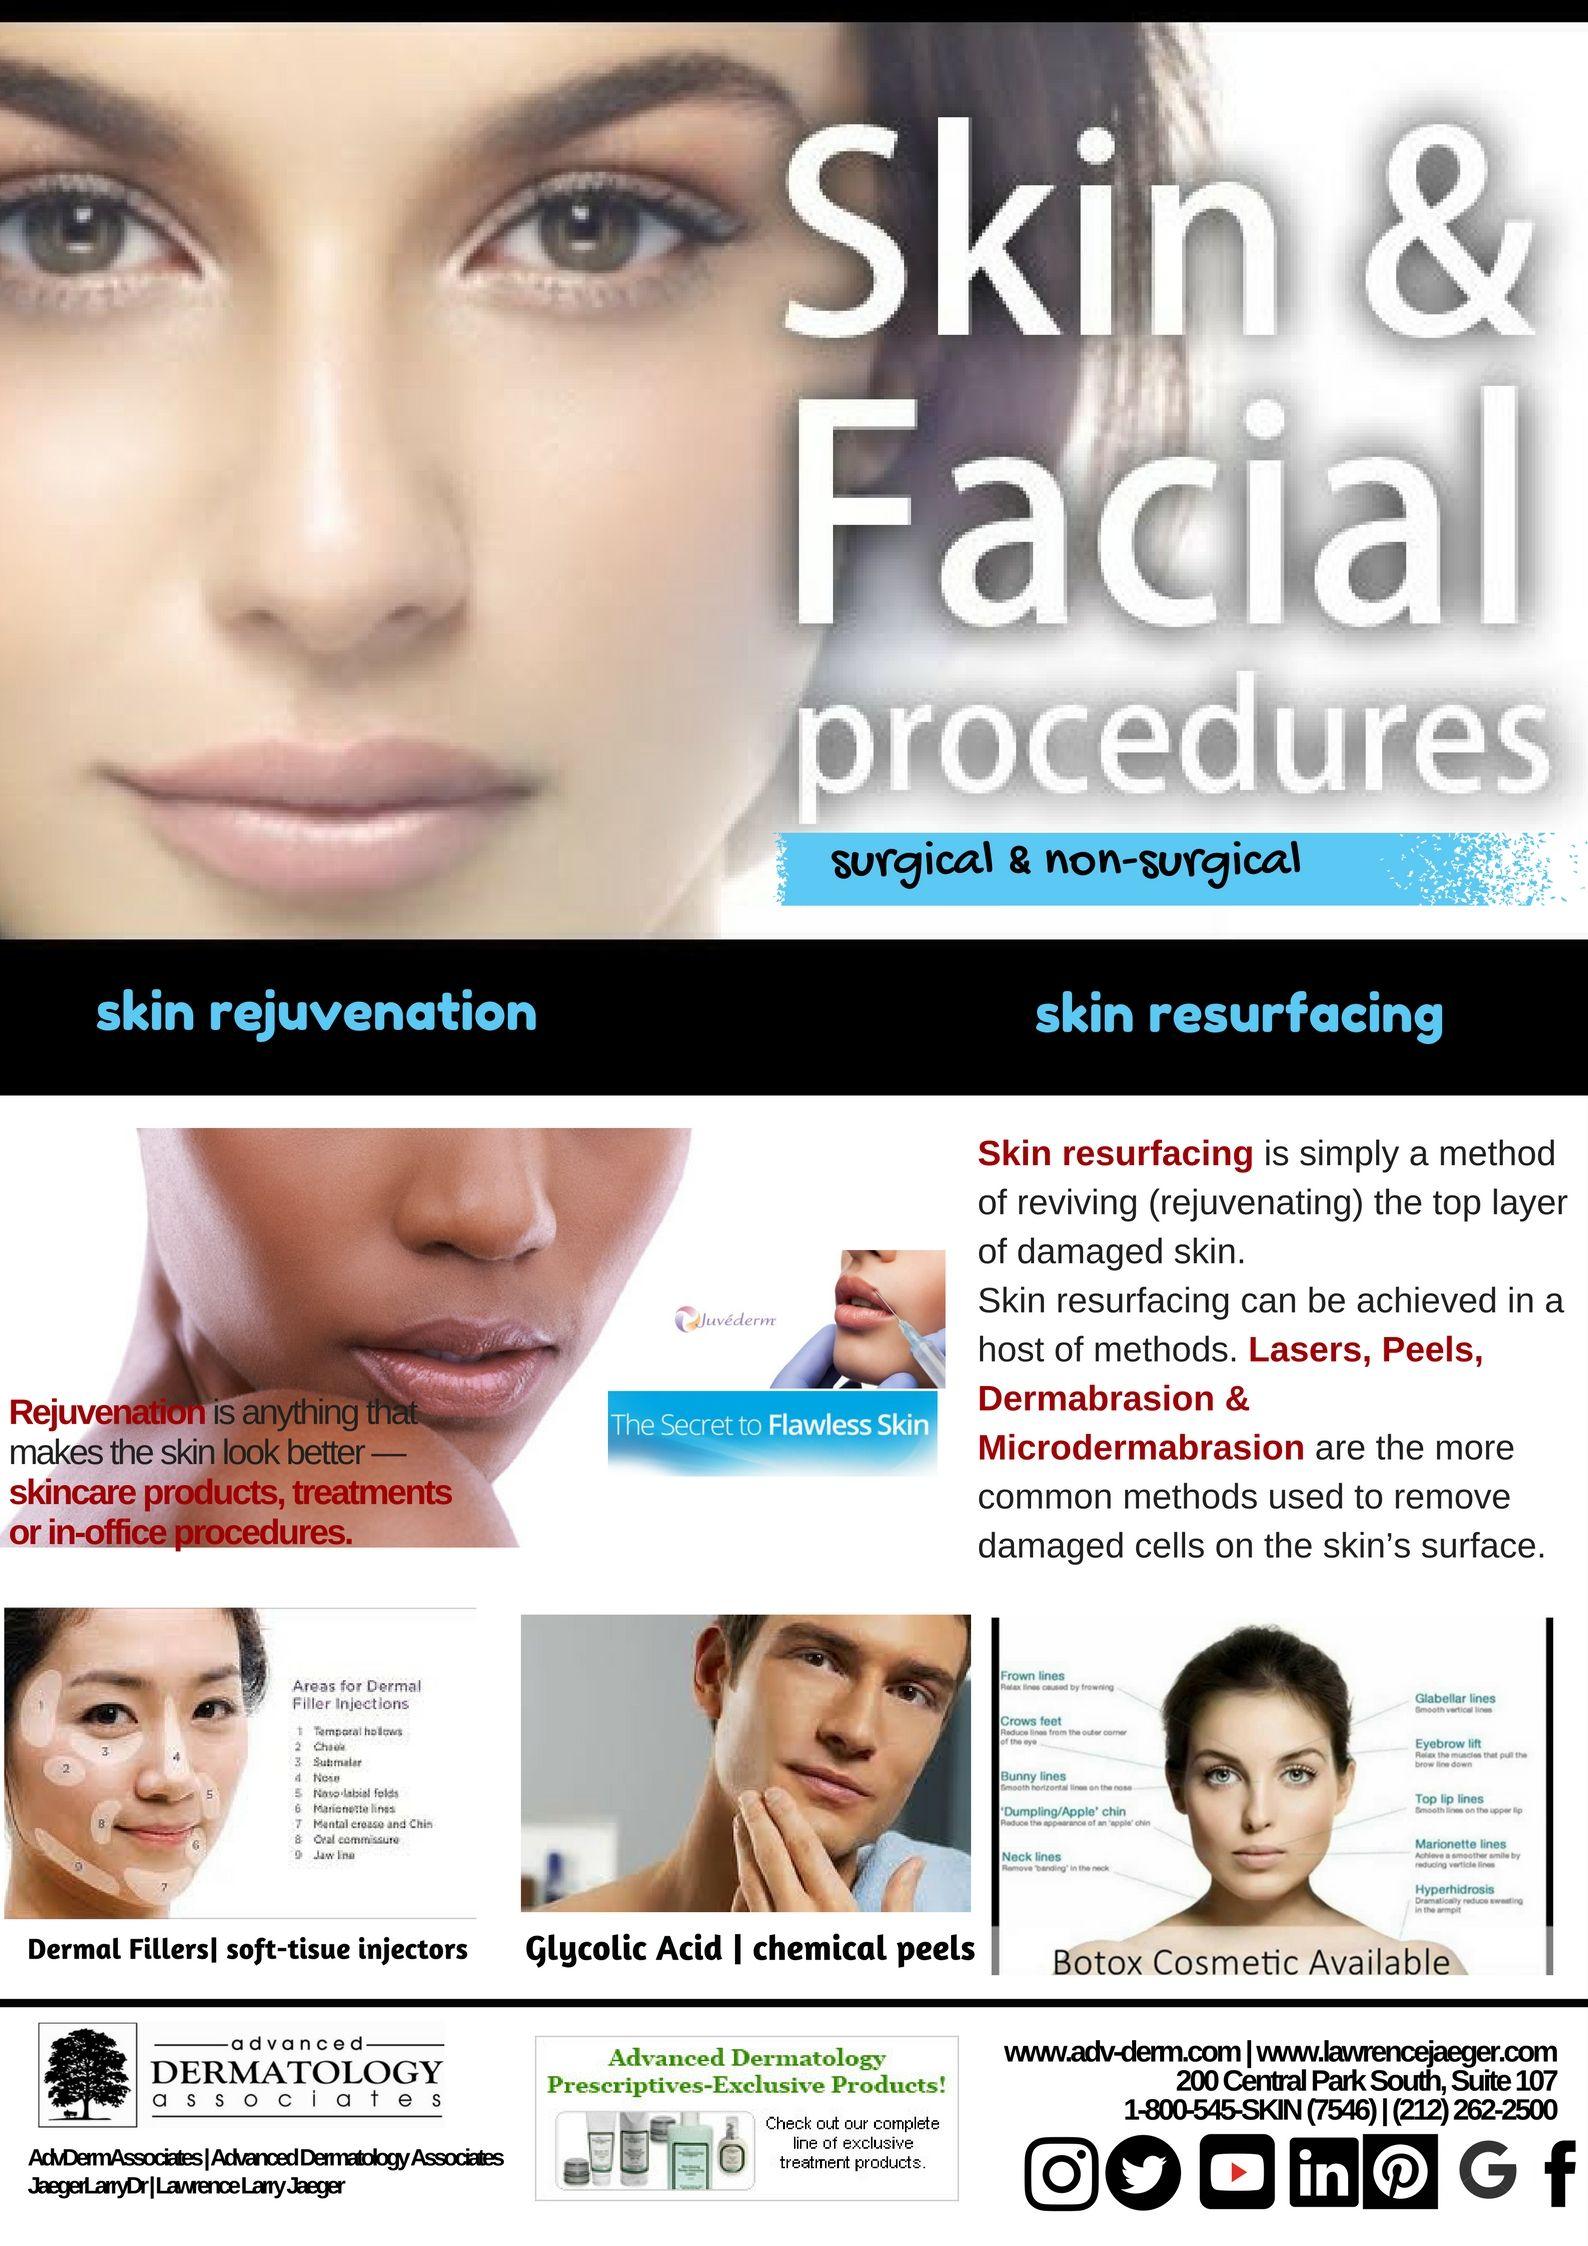 Skin Treatments Facial Skin Skin Care Treatments Skin Treatments